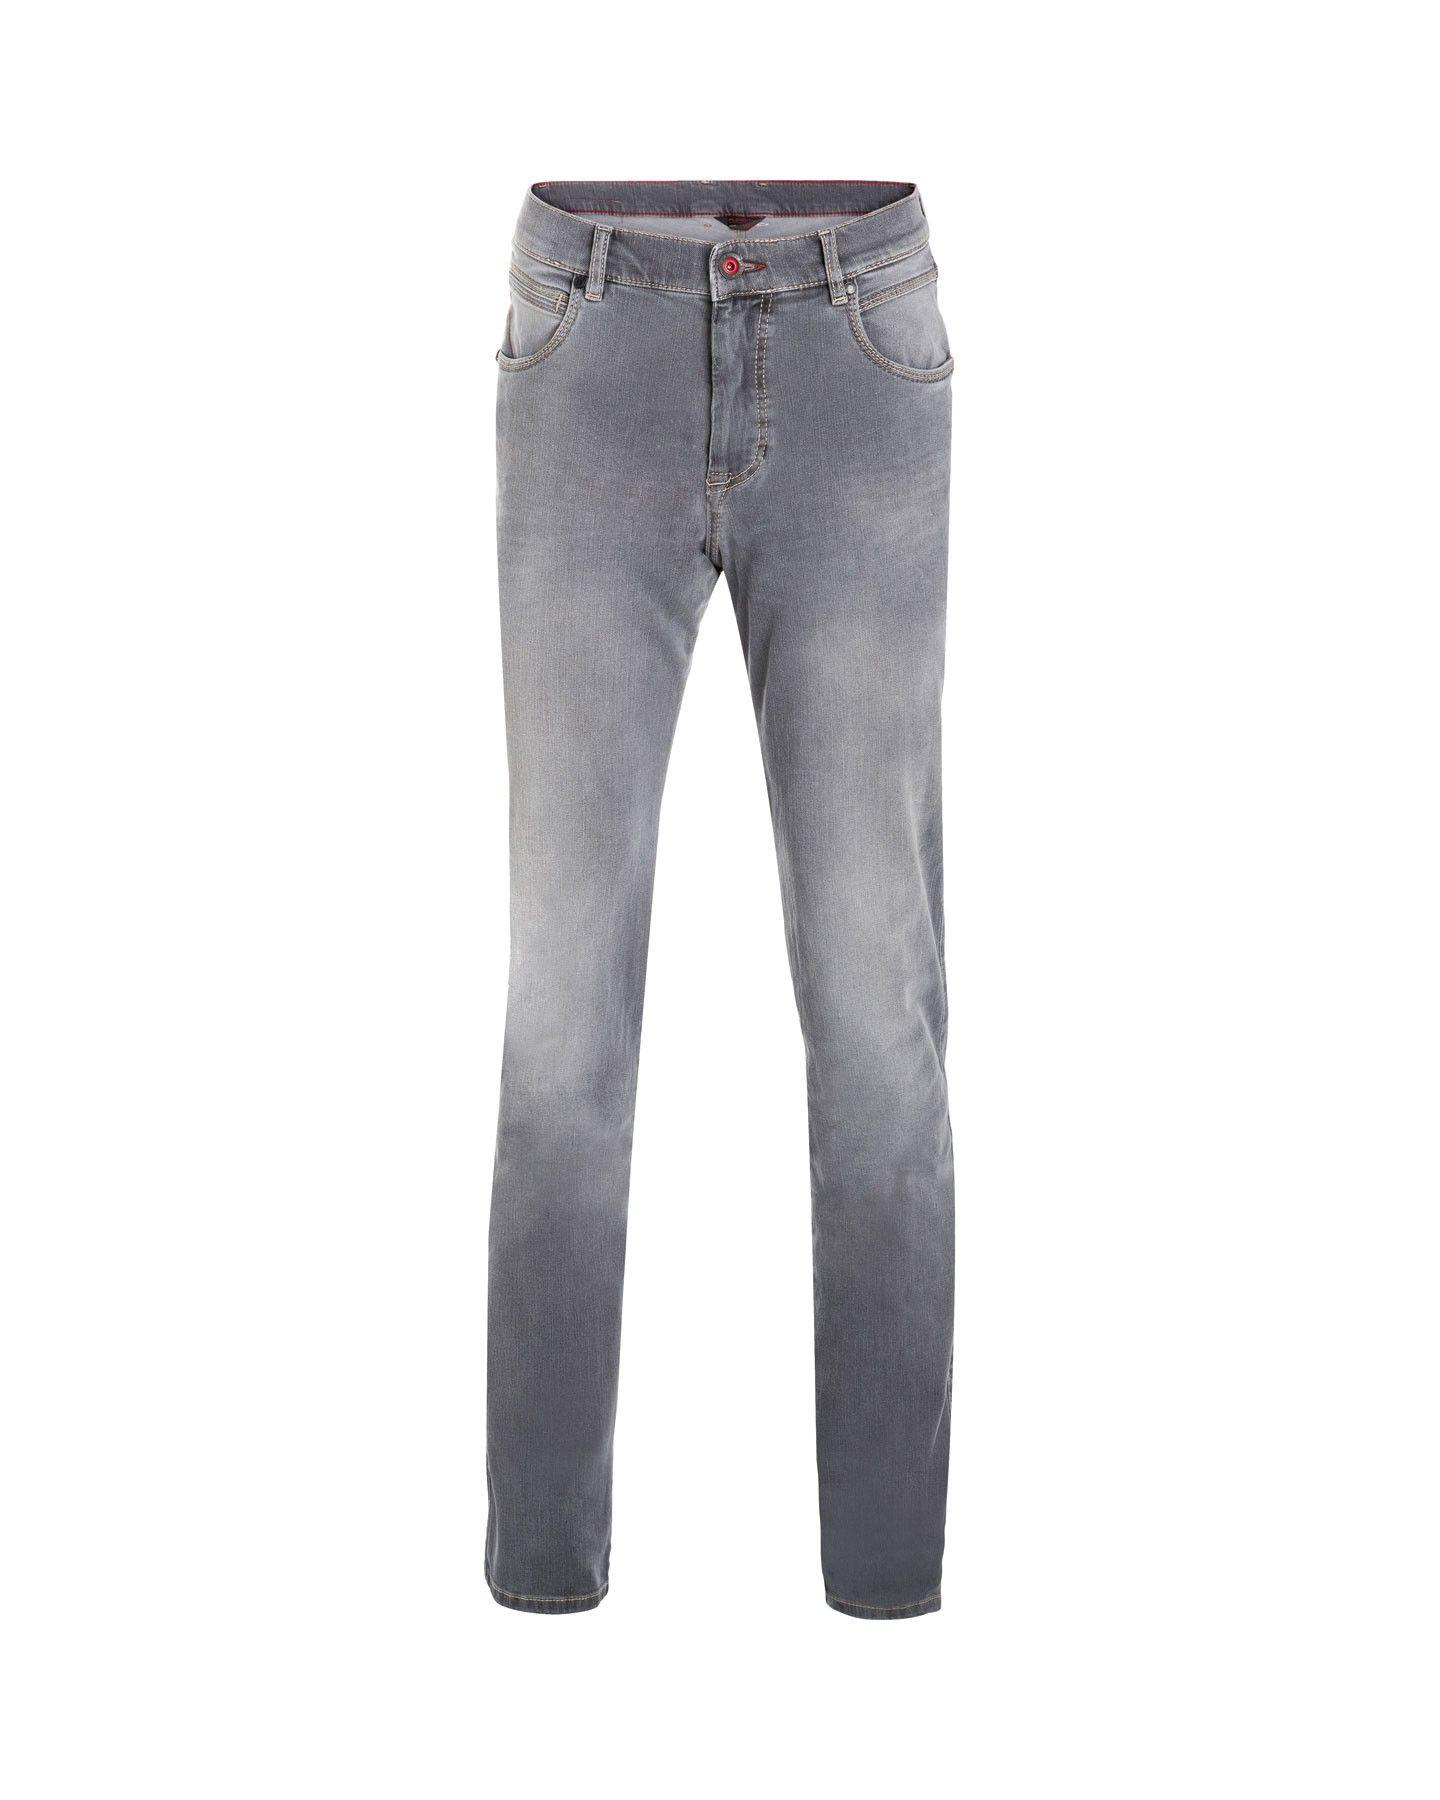 Bugatti - Herren Jeans  (Art. Nr.: 3038D-86676) – Bild 3